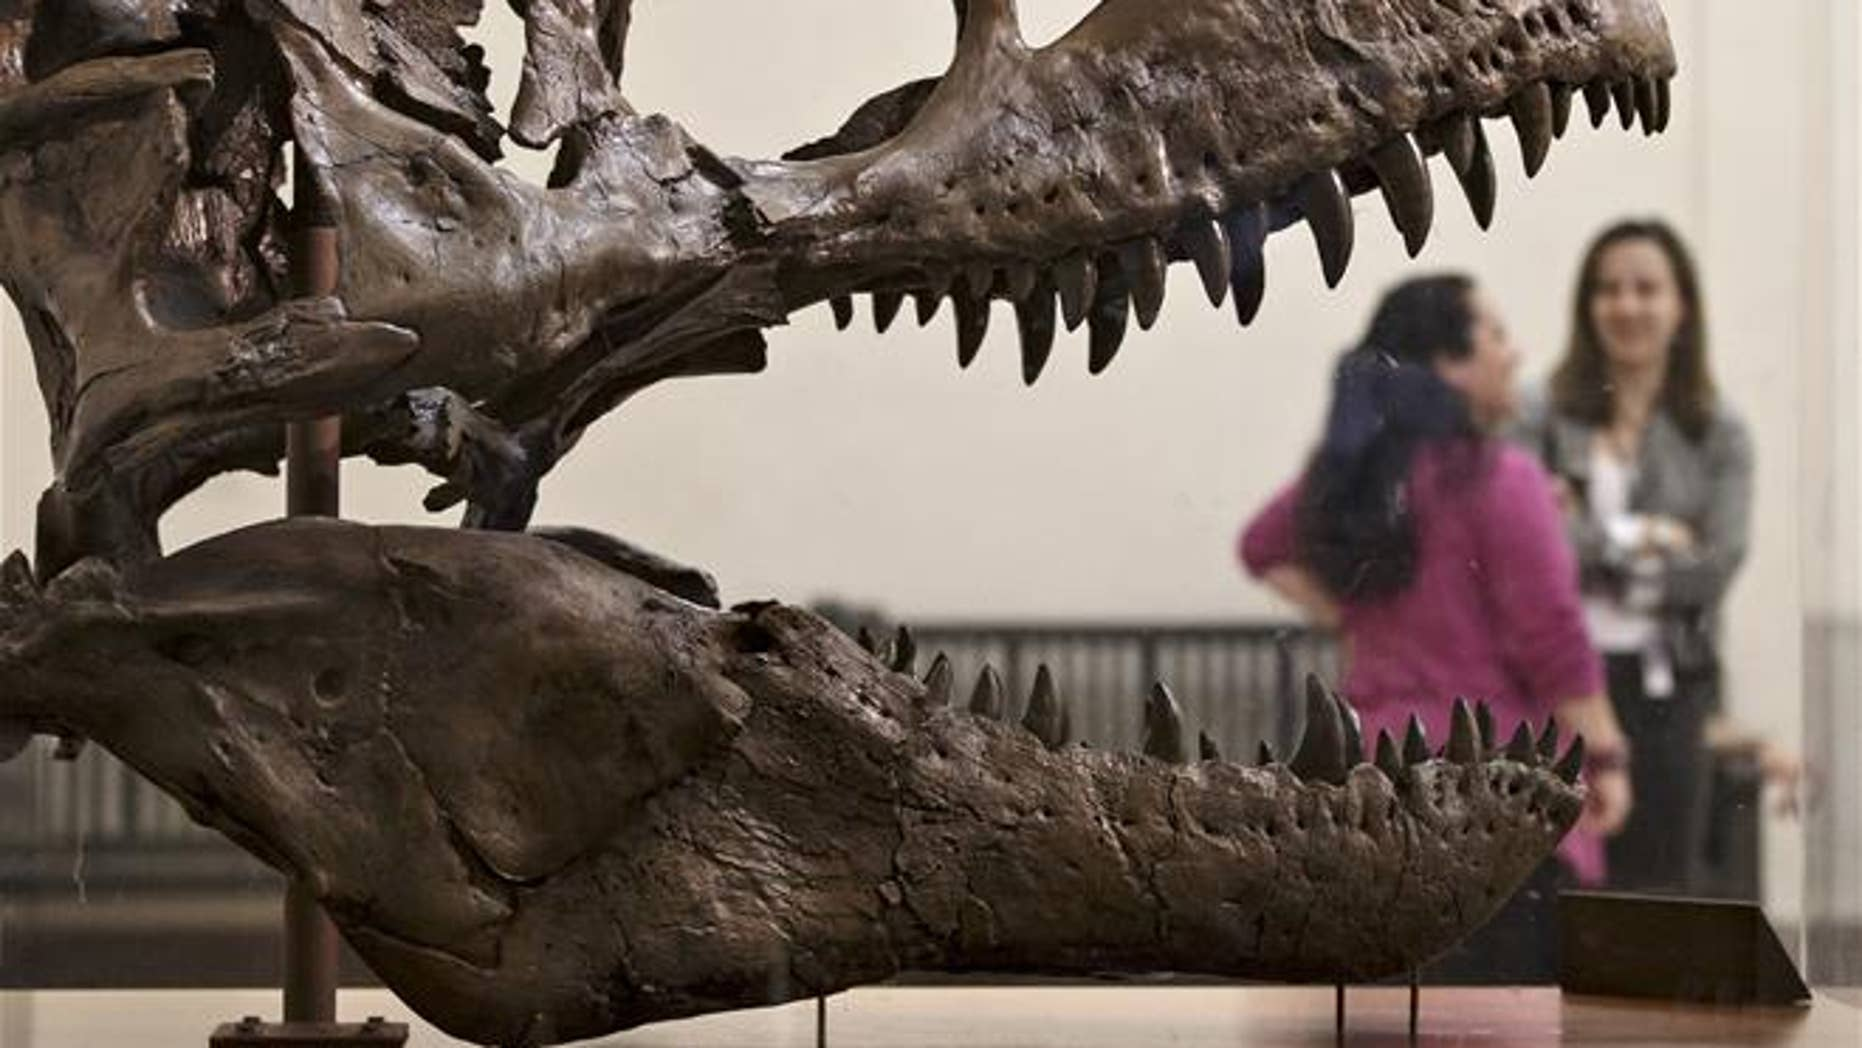 A Tyrannosaurus rex at the Smithsonian Museum of Natural History in Washington.